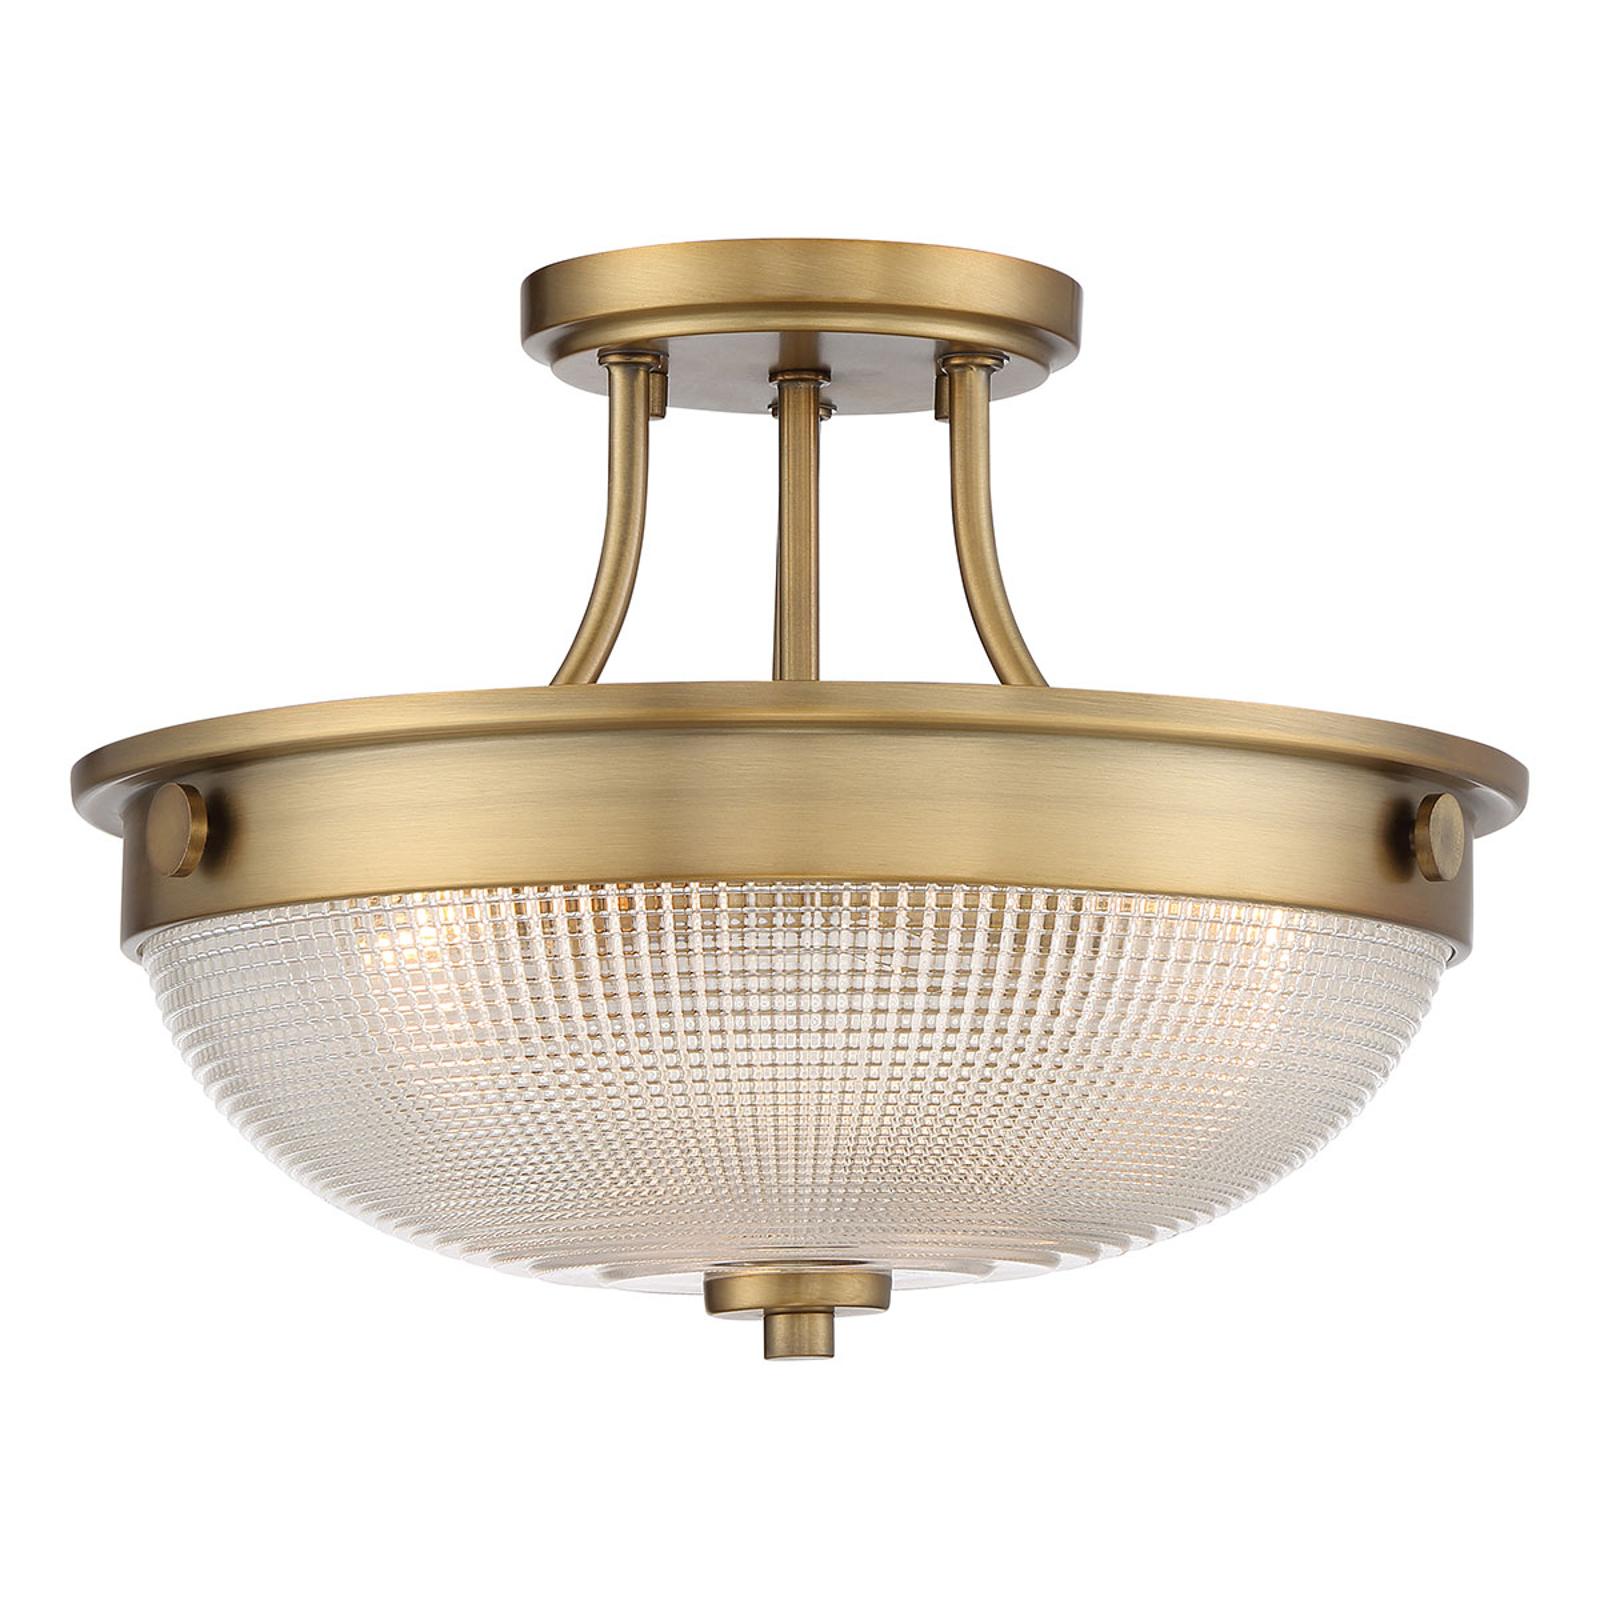 Lampa sufitowa Mantle z dyfuzorem, stary mosiądz